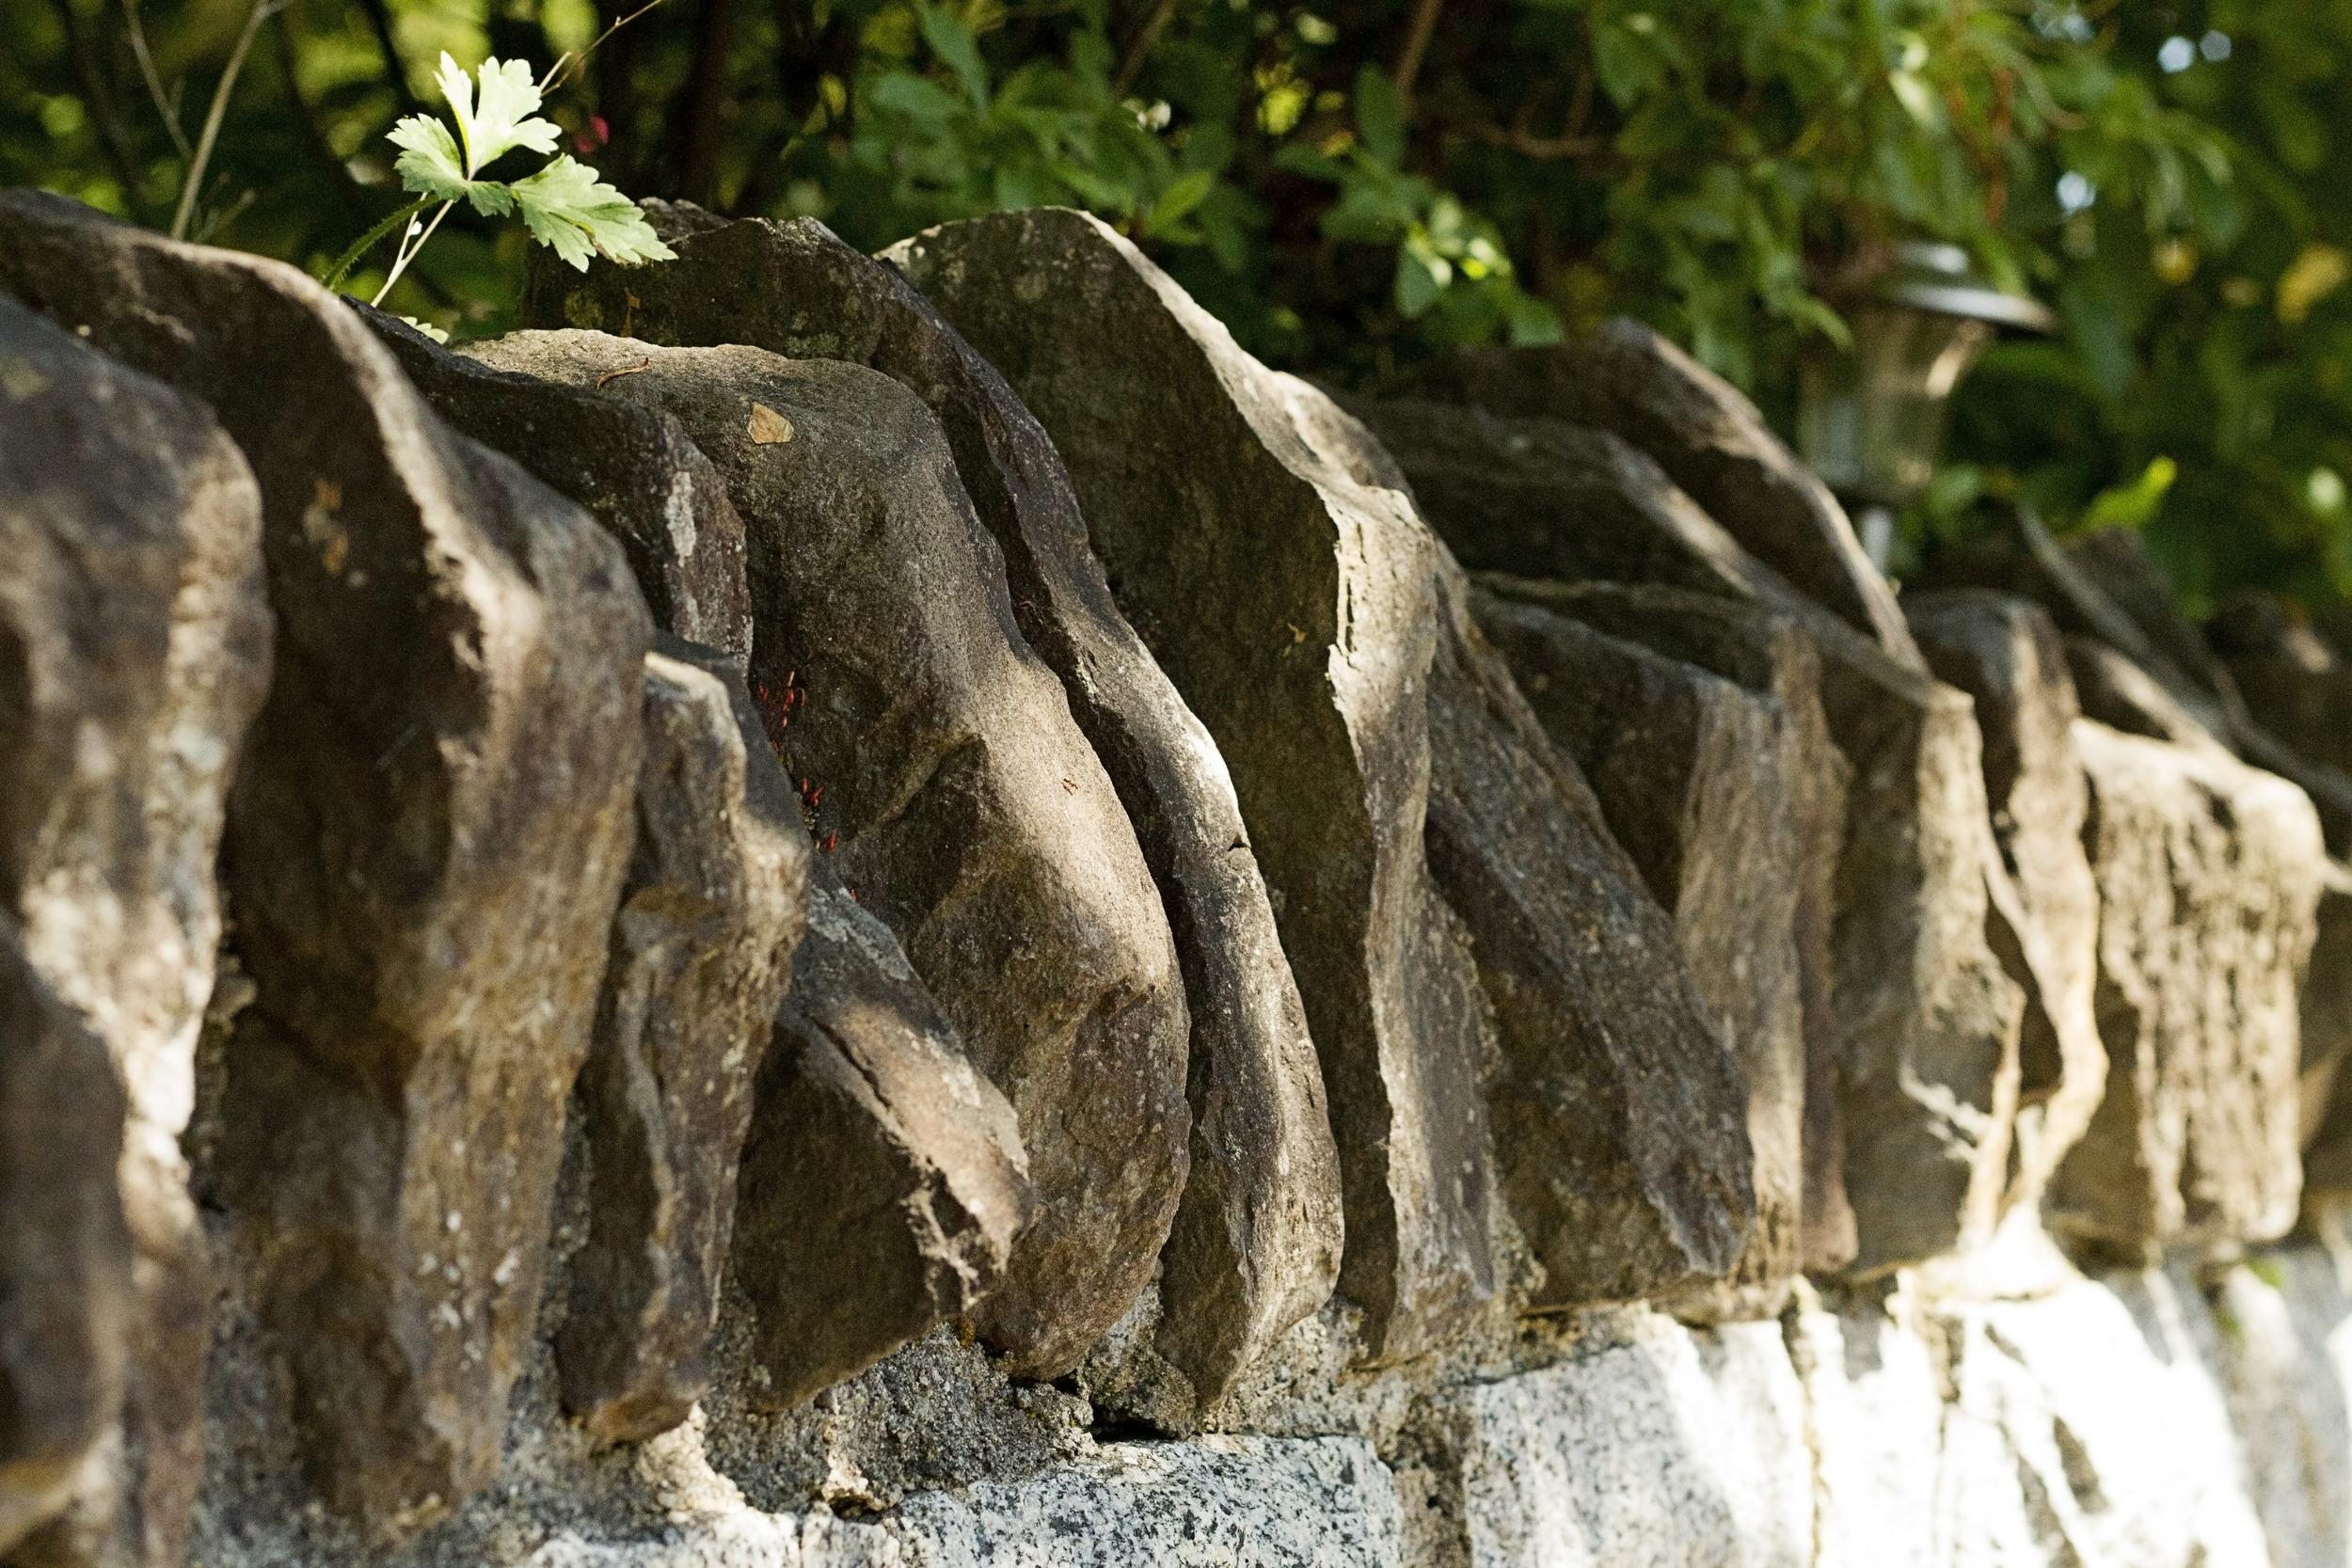 Stone_18.jpg